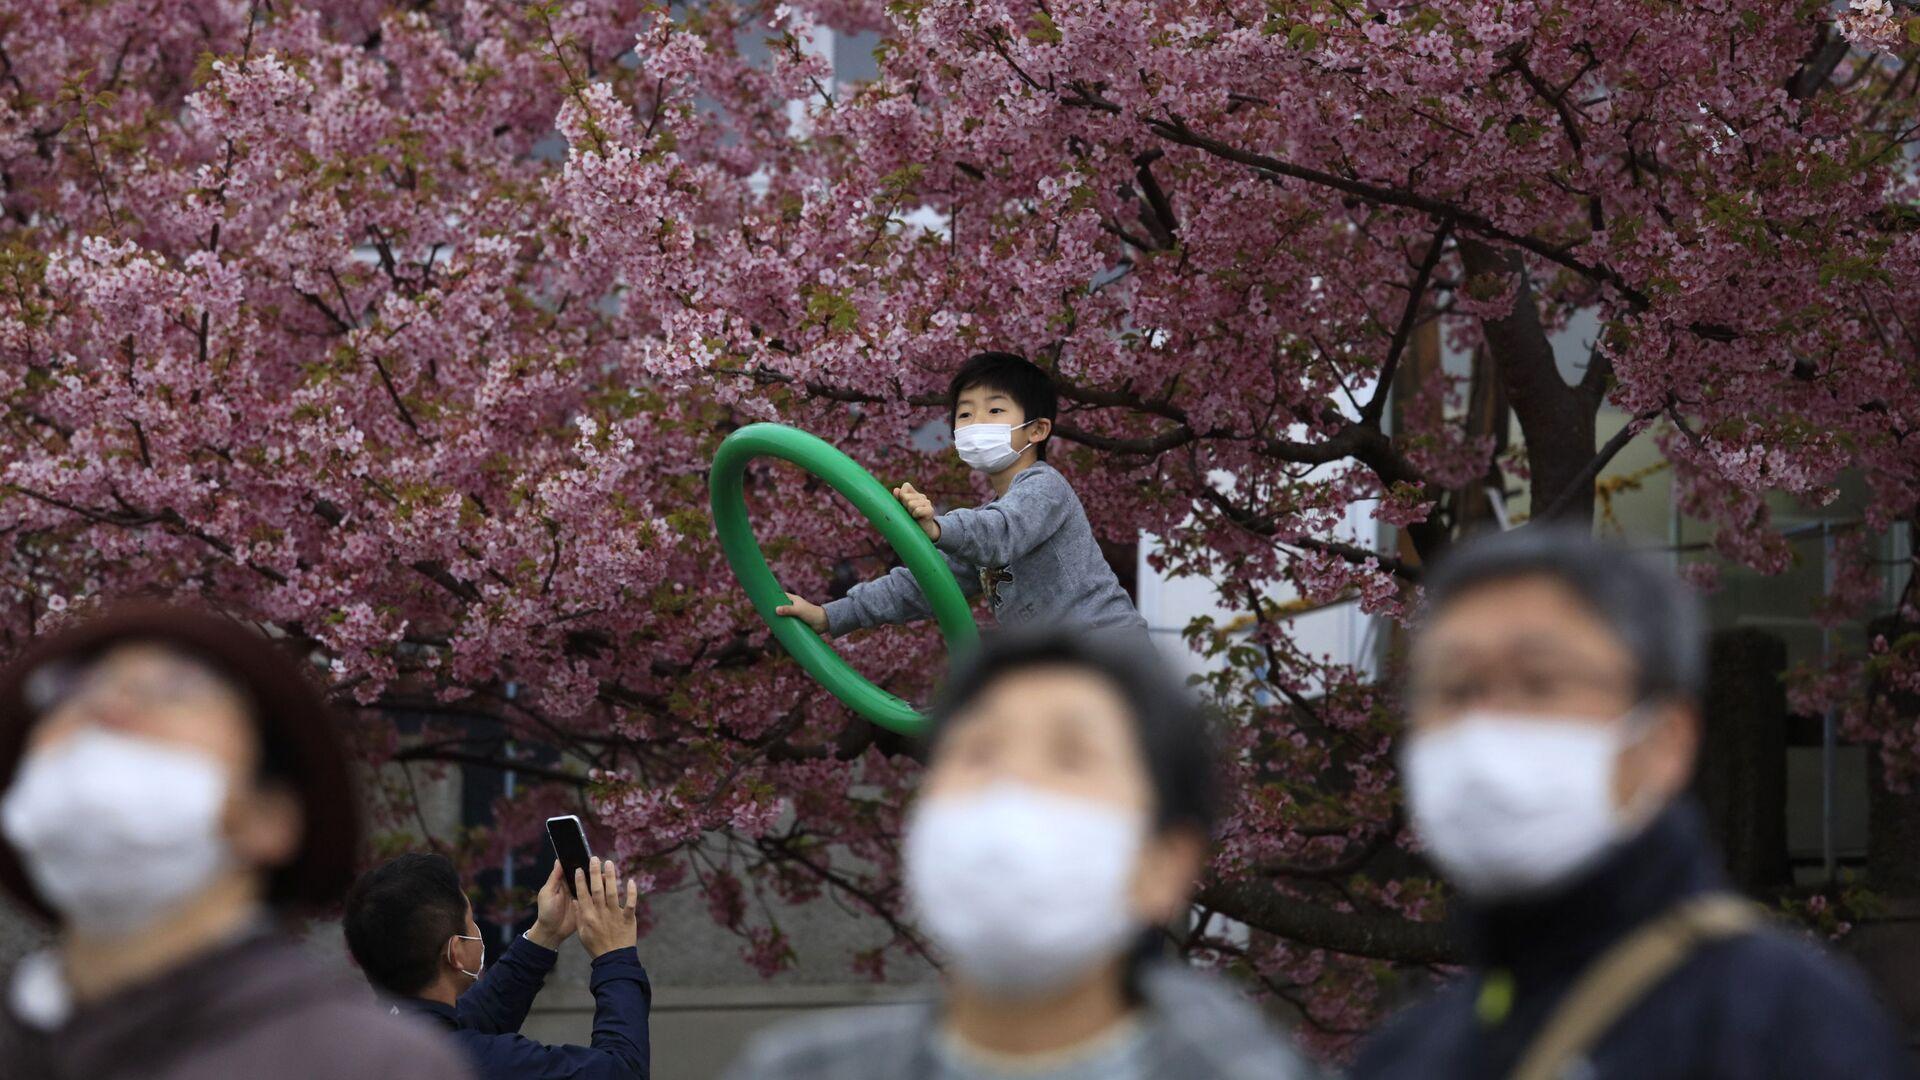 Gente in mascherine in Giappone - Sputnik Italia, 1920, 31.08.2021